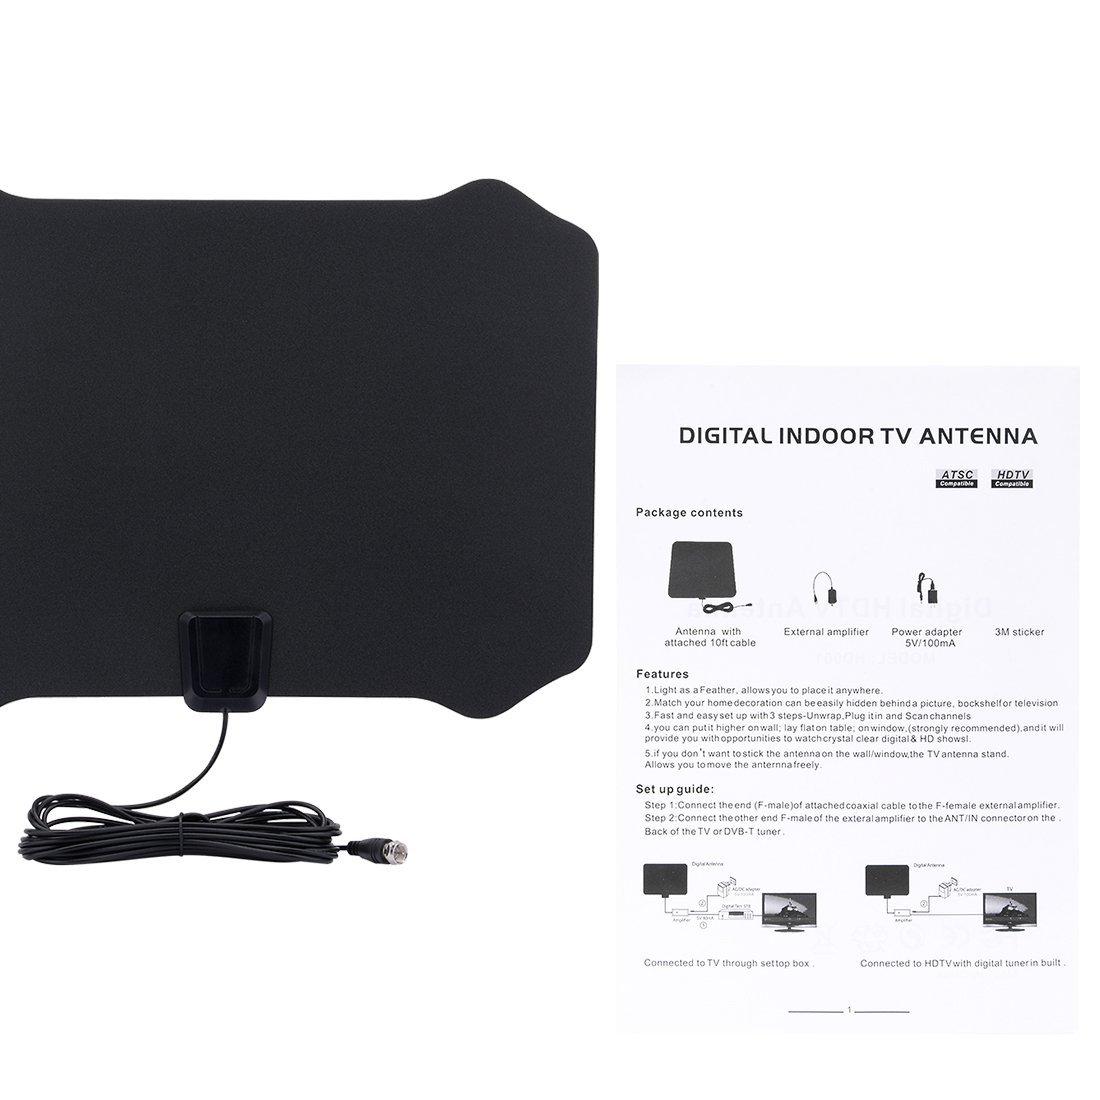 Amazon.com: DealMux Amplified HDTV Antenna - 50 Mile Gama com Amplificador destacável USB Power Supply: Home Audio & Theater